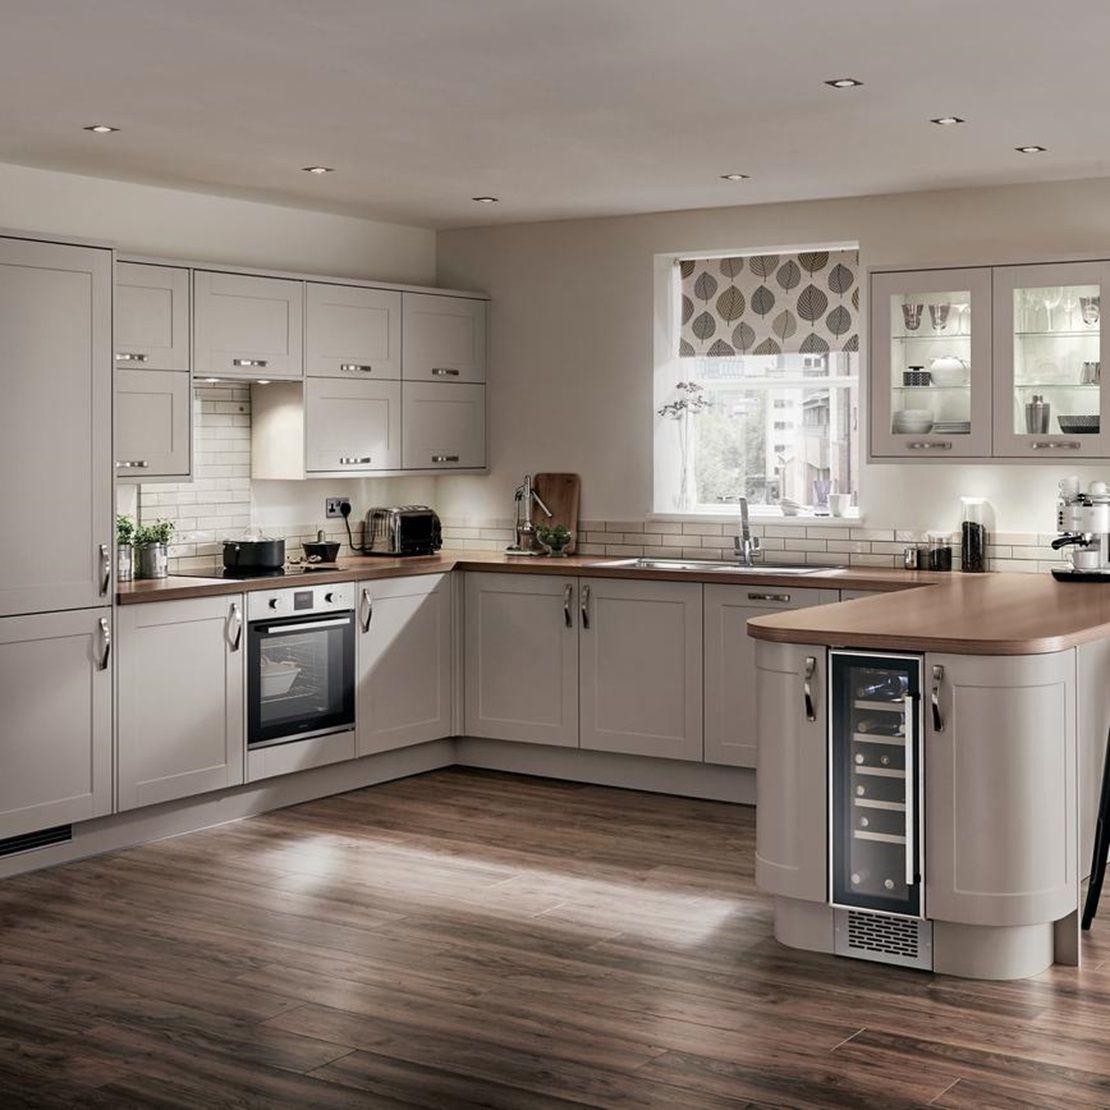 fitted kitchens in 2020 u shaped kitchen l shaped kitchen designs modern l shaped kitchens on kitchen ideas u shaped id=91311